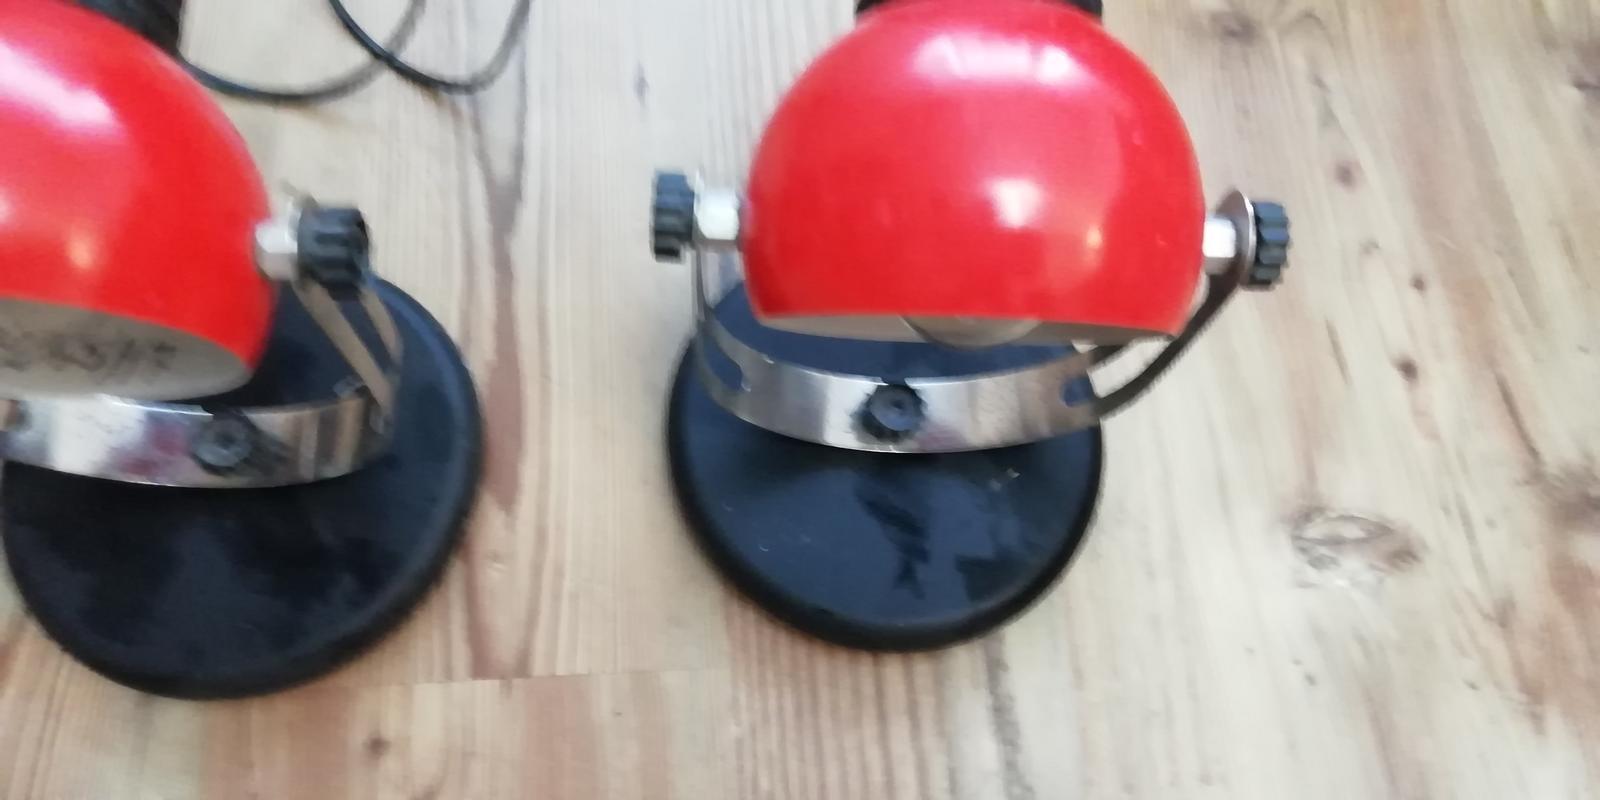 Retro lampy - 2 kusy - Obrázok č. 1